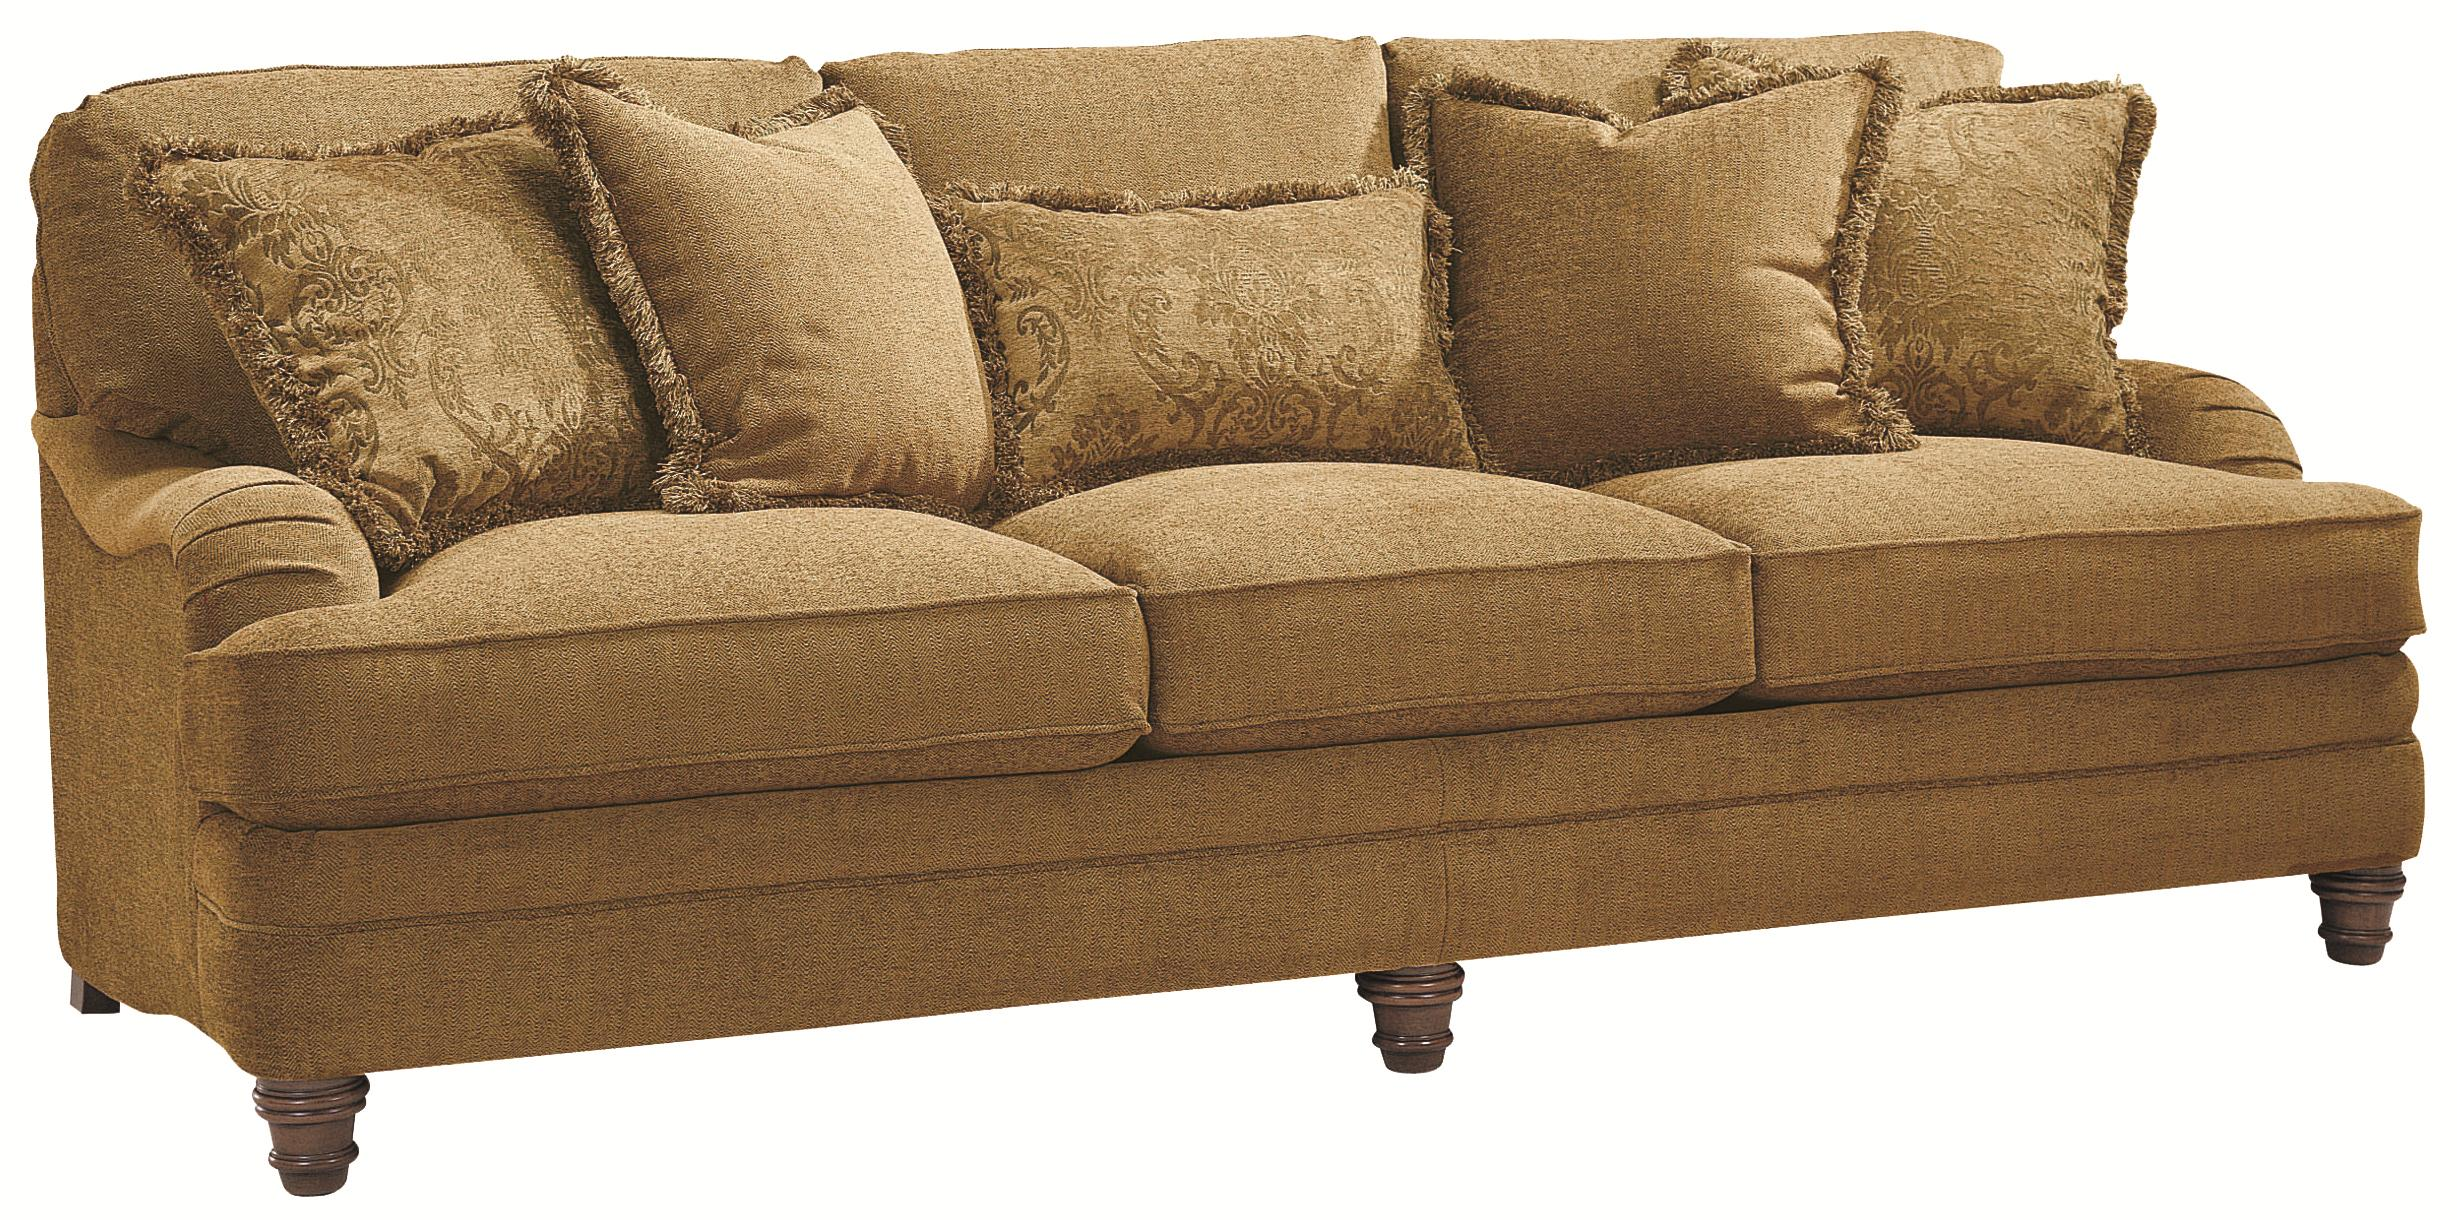 Bernhardt Leather Sofa Price Bernhardt Foster 2 Piece